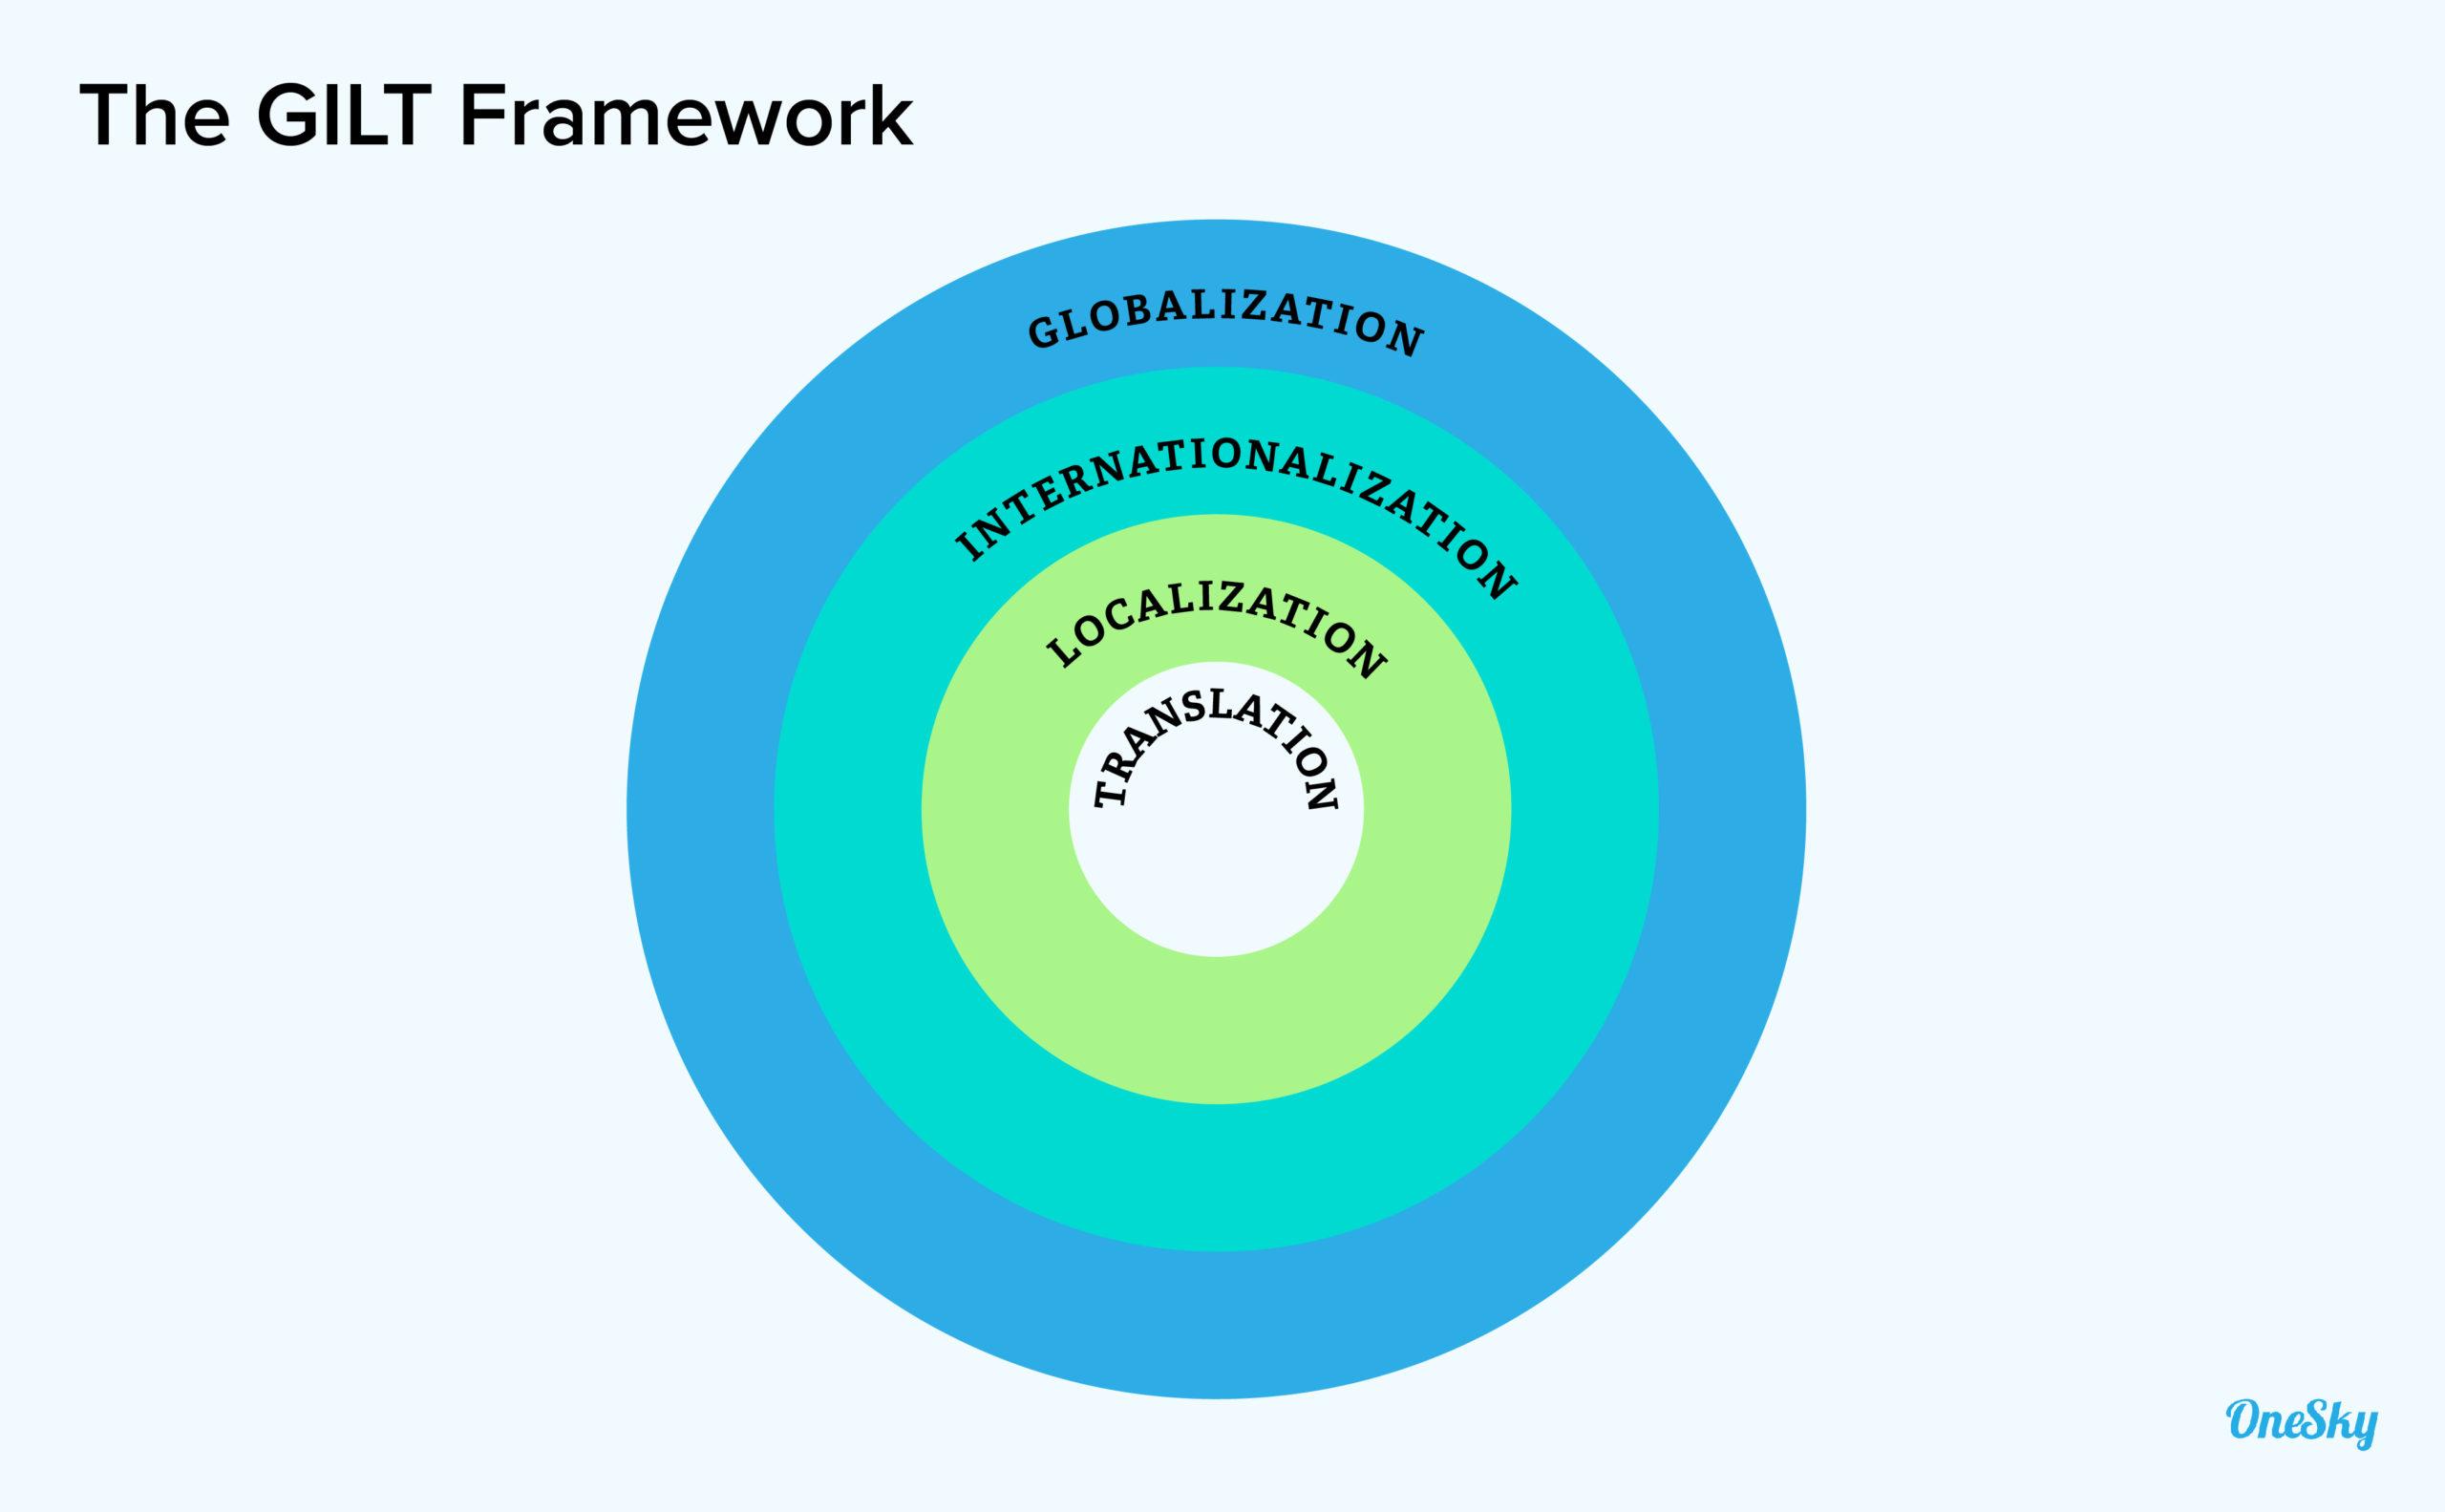 The GILT Framework